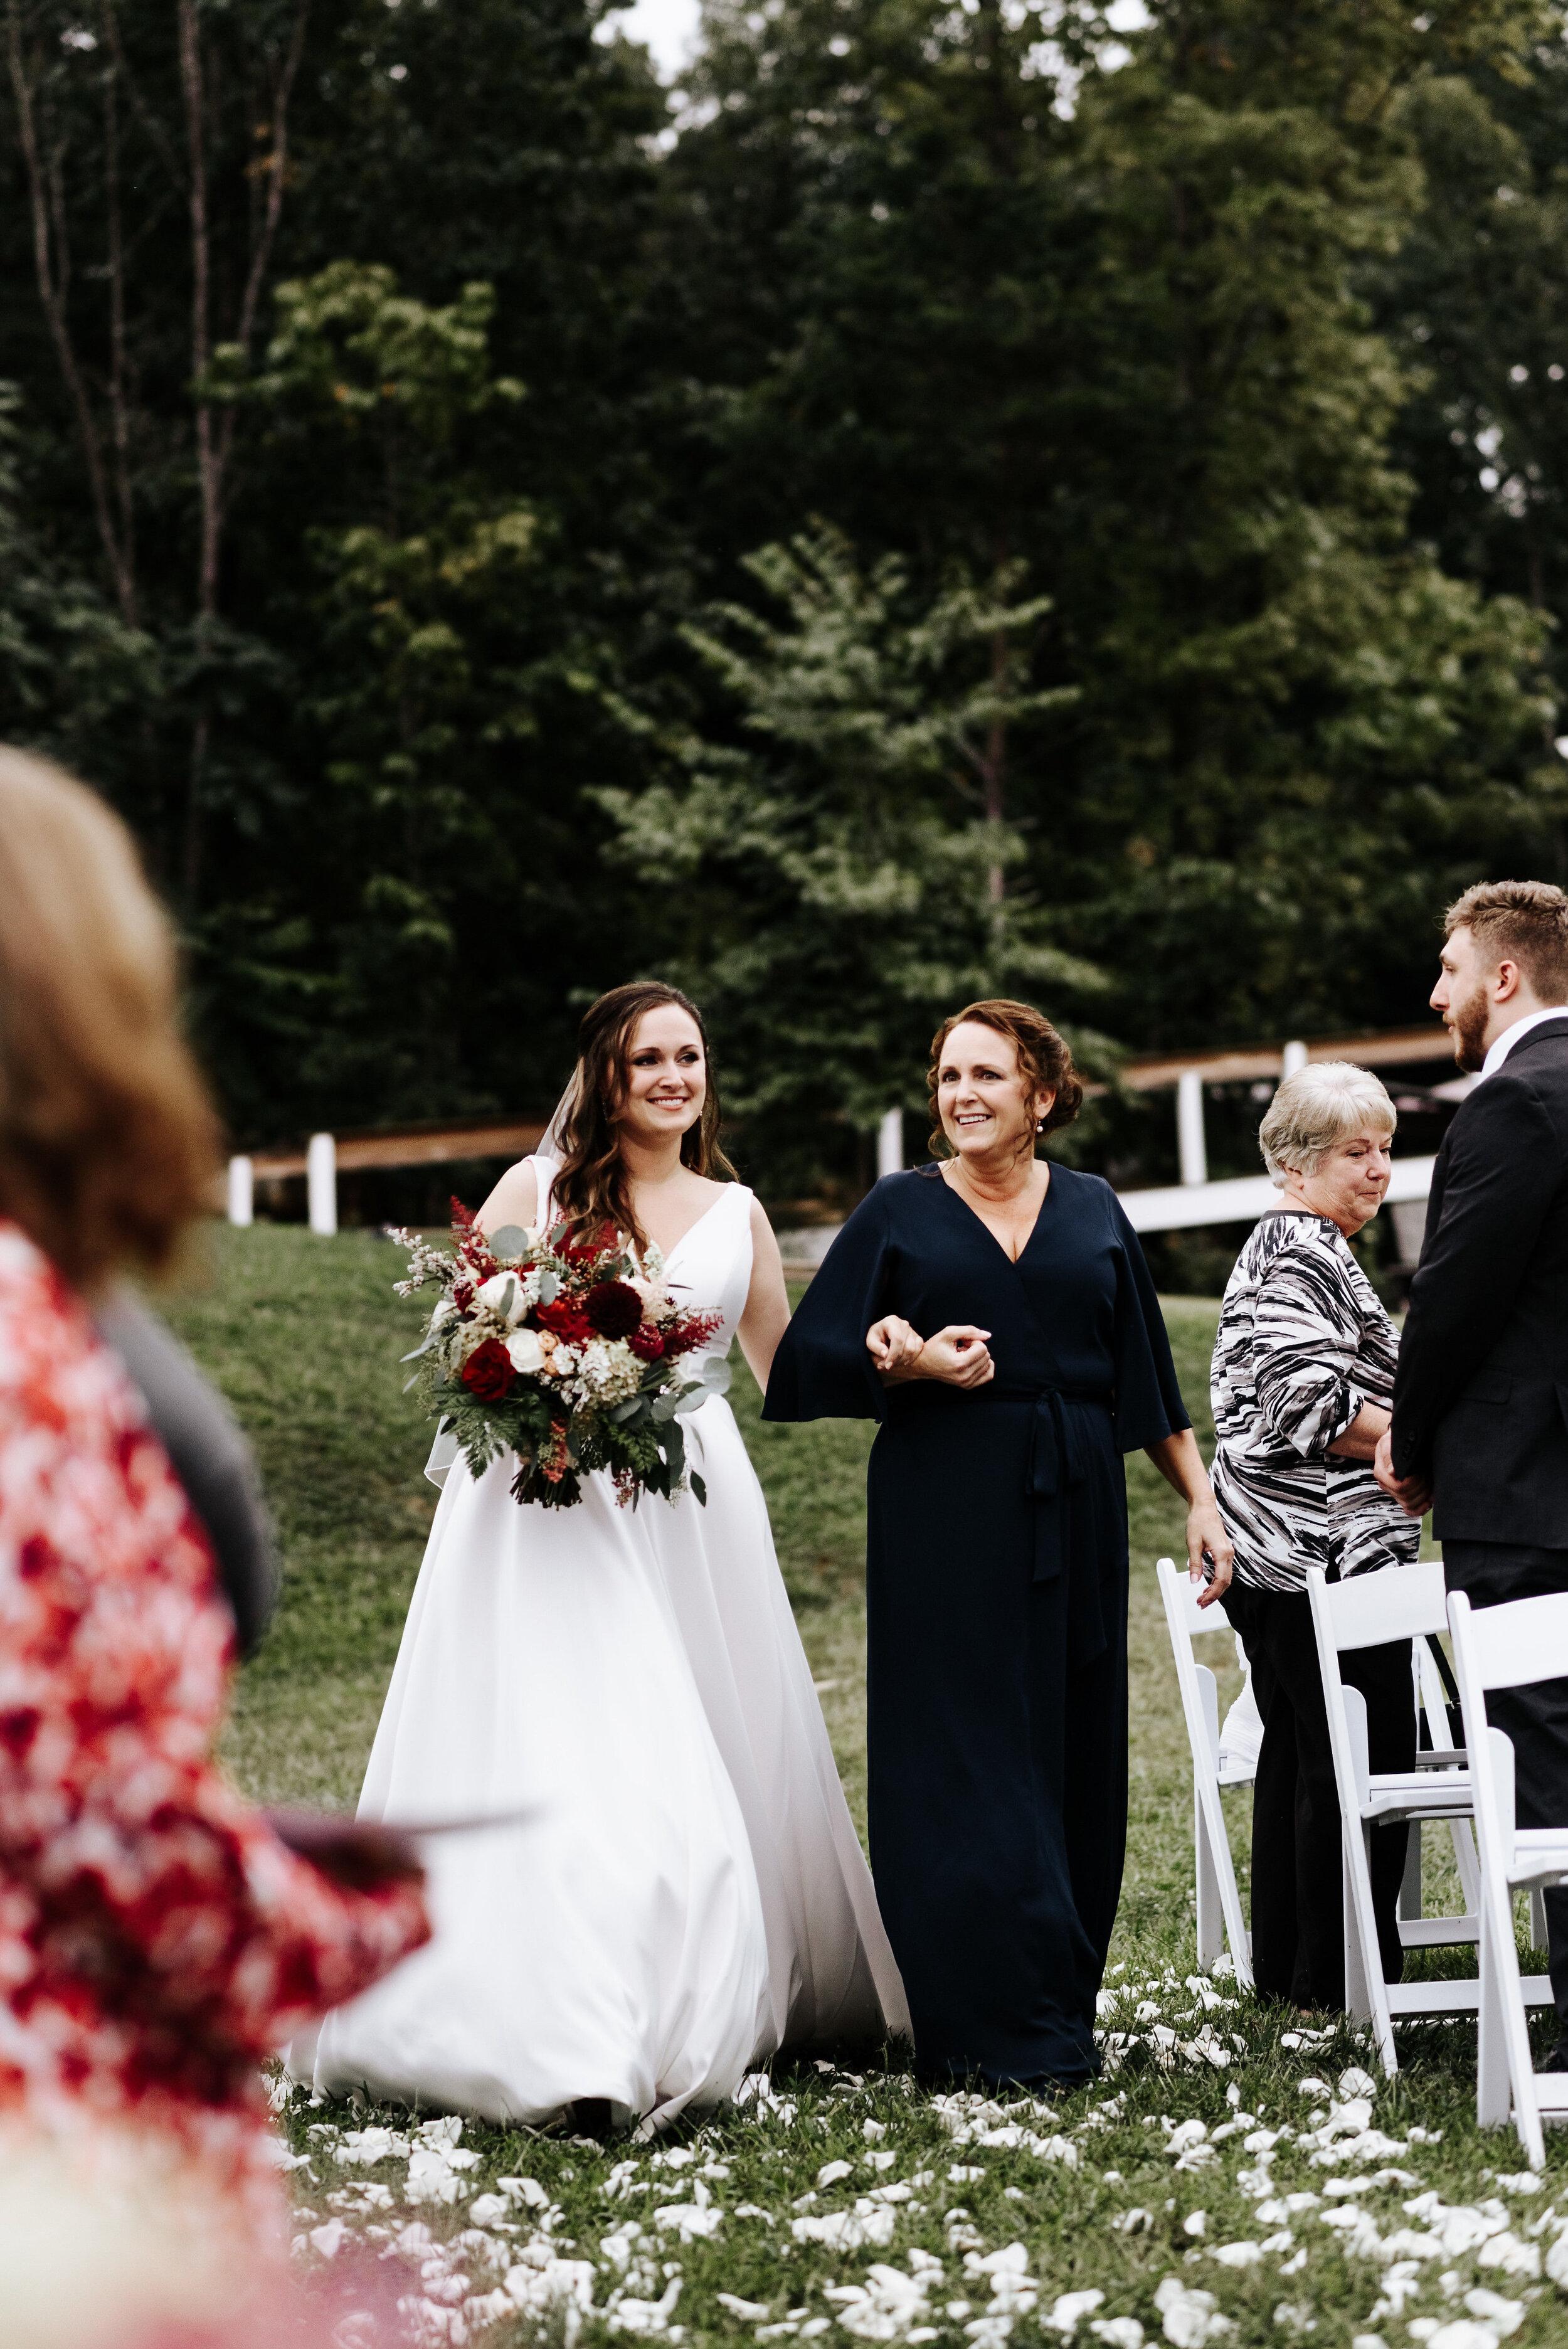 Allison_Nolan_Moss_Vineyards_Wedding_Charlottesville_Virginia_Photography_by_V_43.jpg